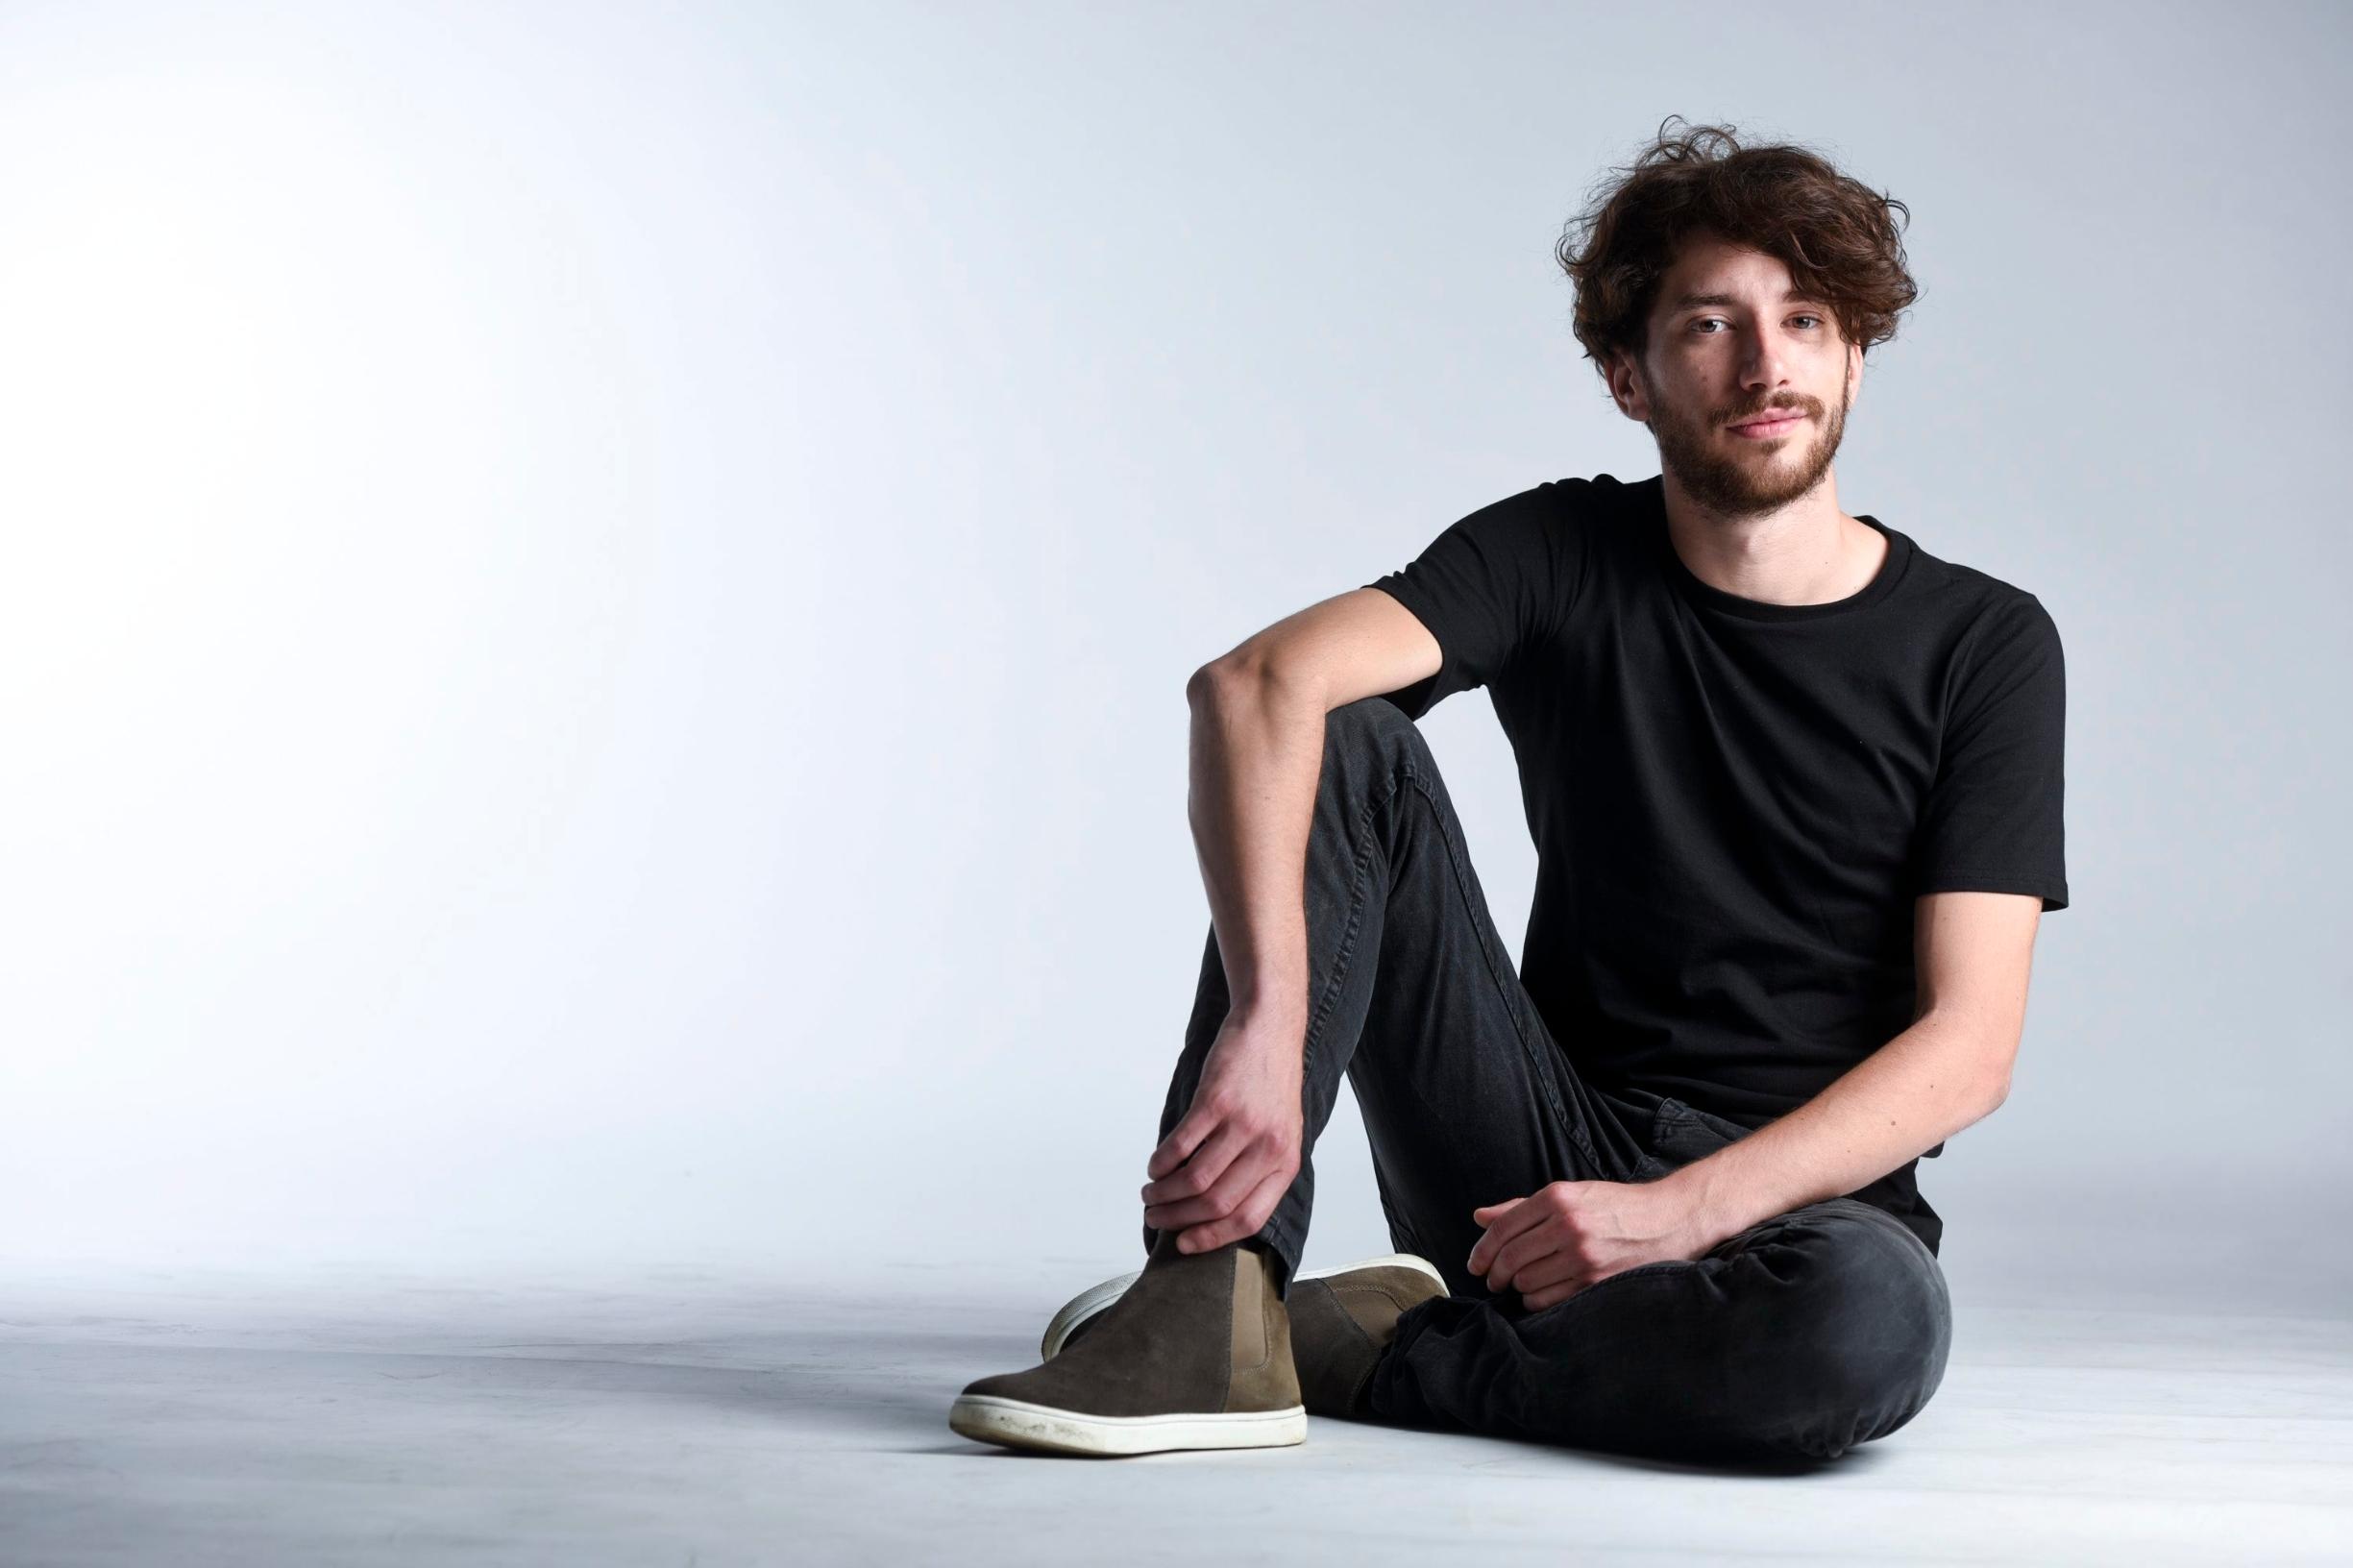 Zagreb, 070718. Koranska 2. Matino Antunovic, mladi glumac i student sveucilista Libertas. Foto: Darko Tomas / CROPIX